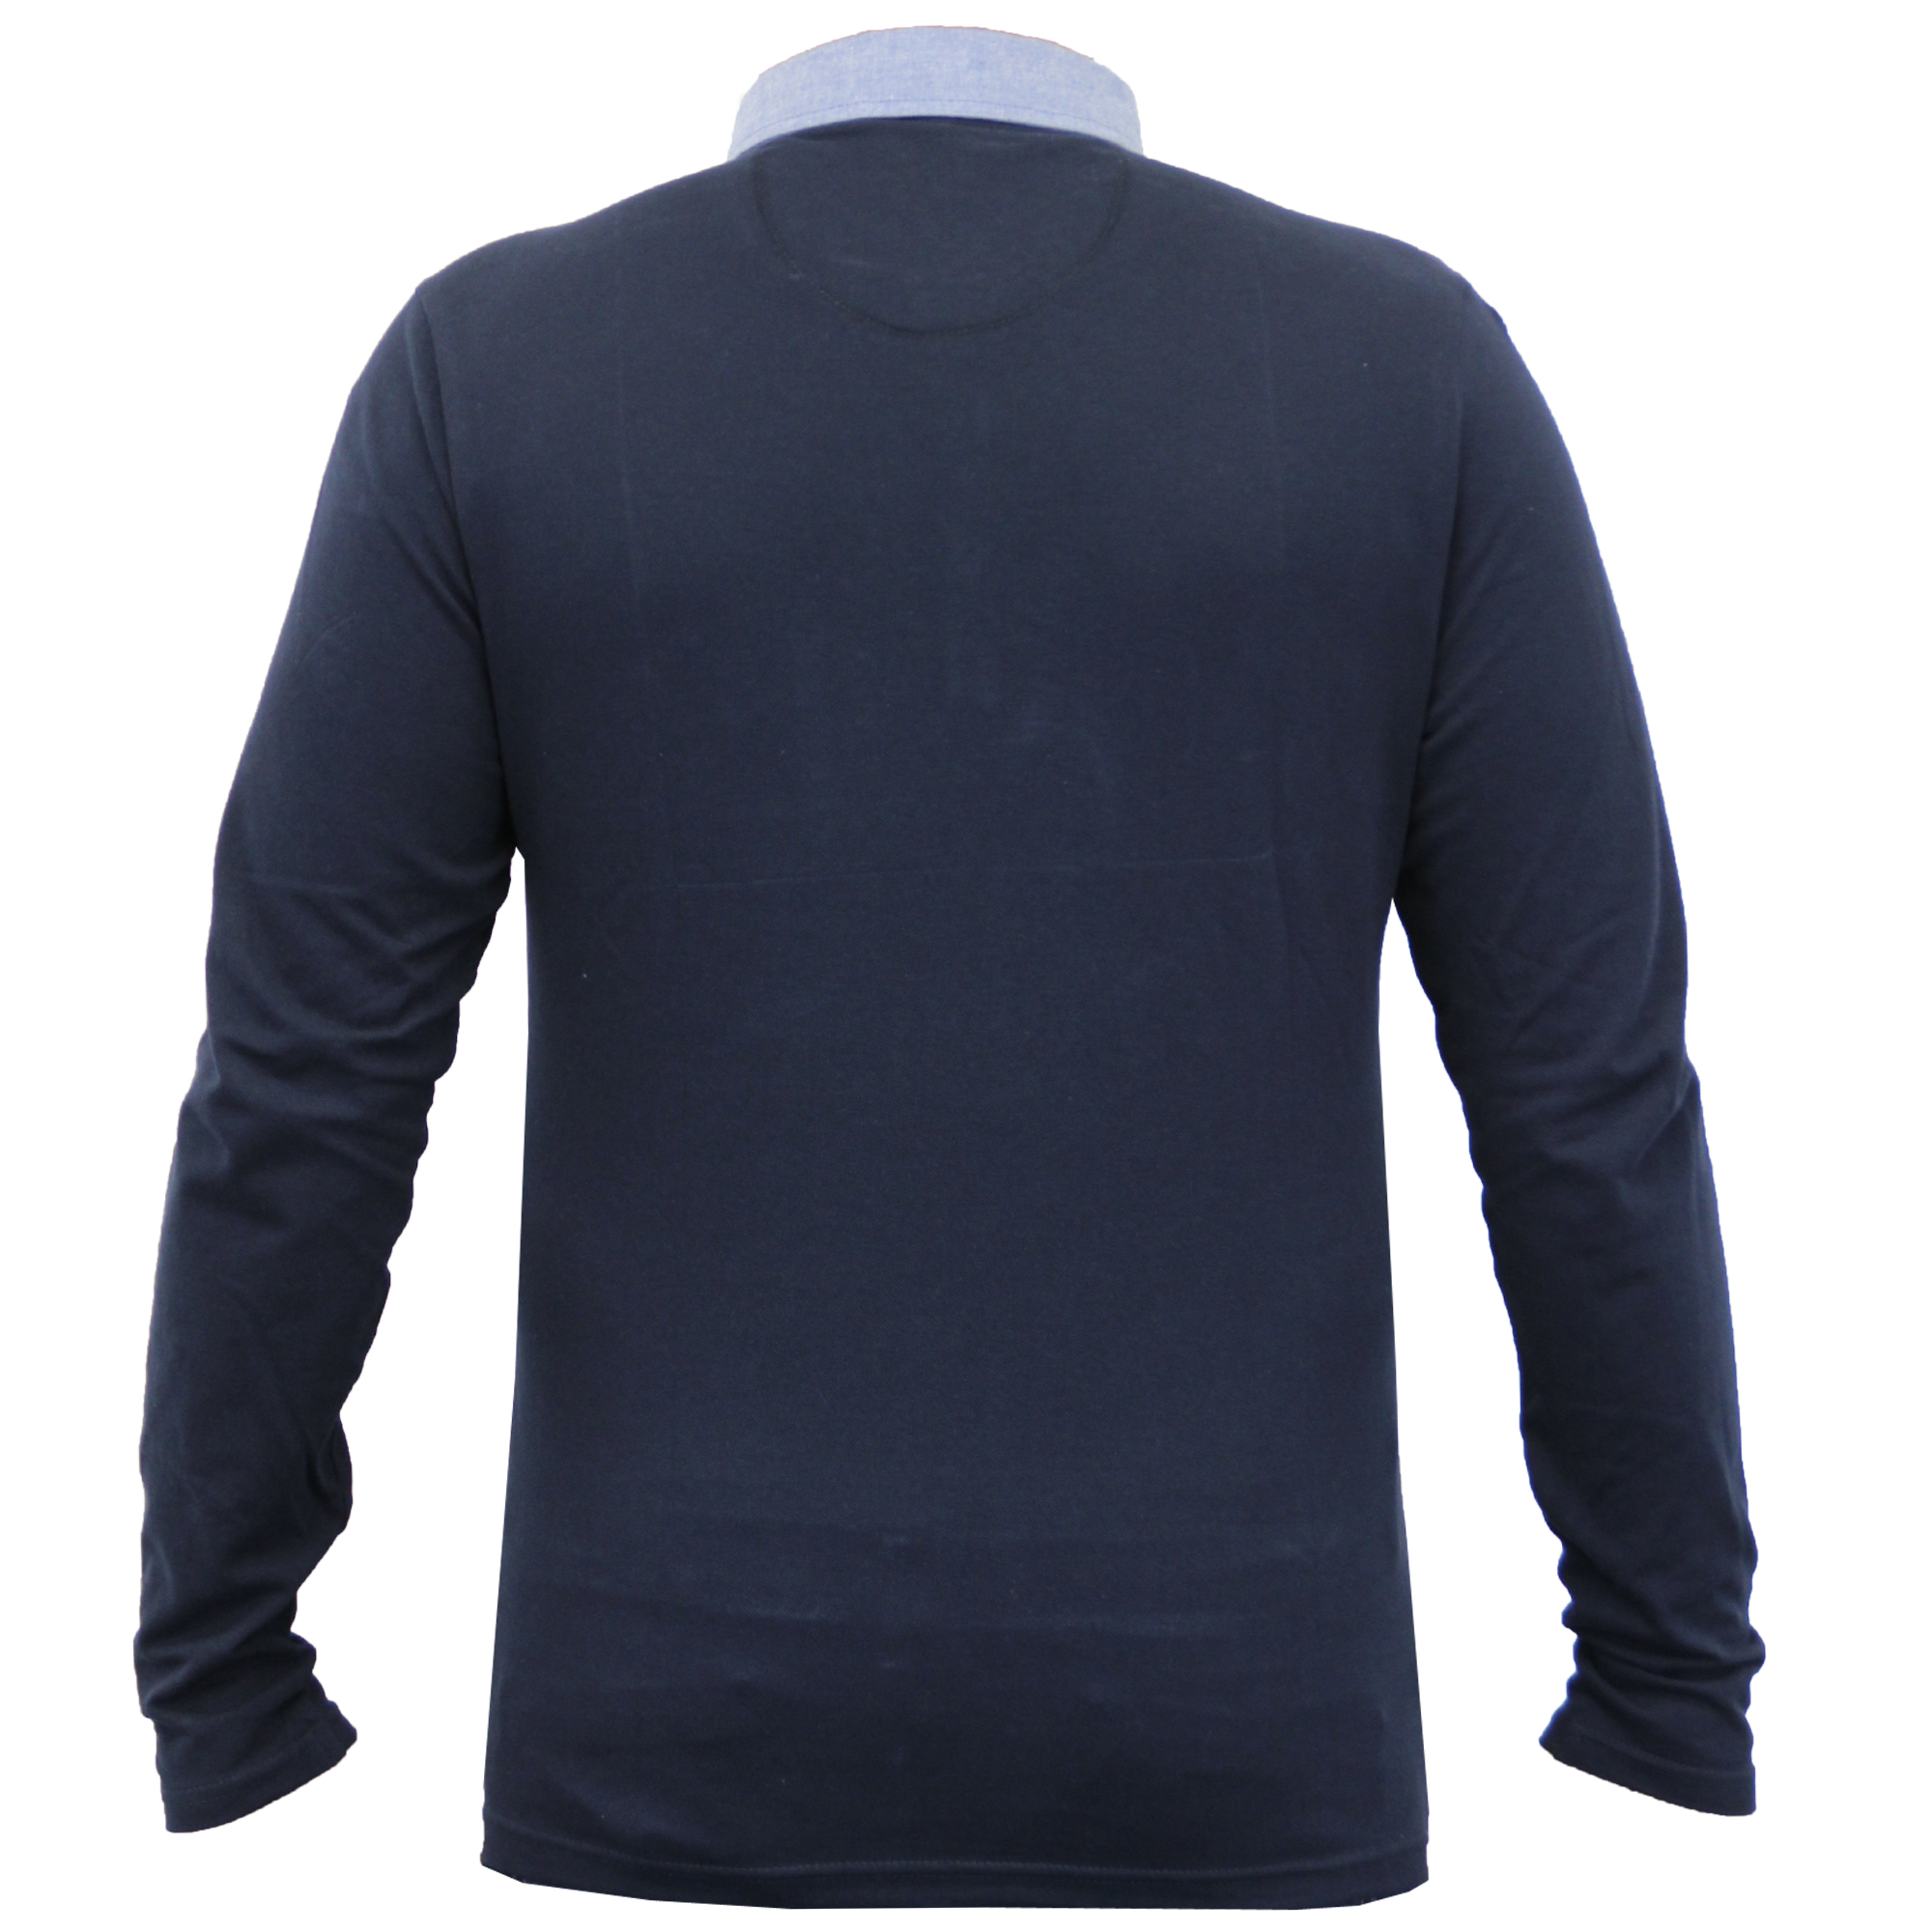 Homme-a-Manches-Longues-Jersey-Top-Brave-Soul-Pique-Polo-T-Shirt-A-Col-Ete-Neuf miniature 24